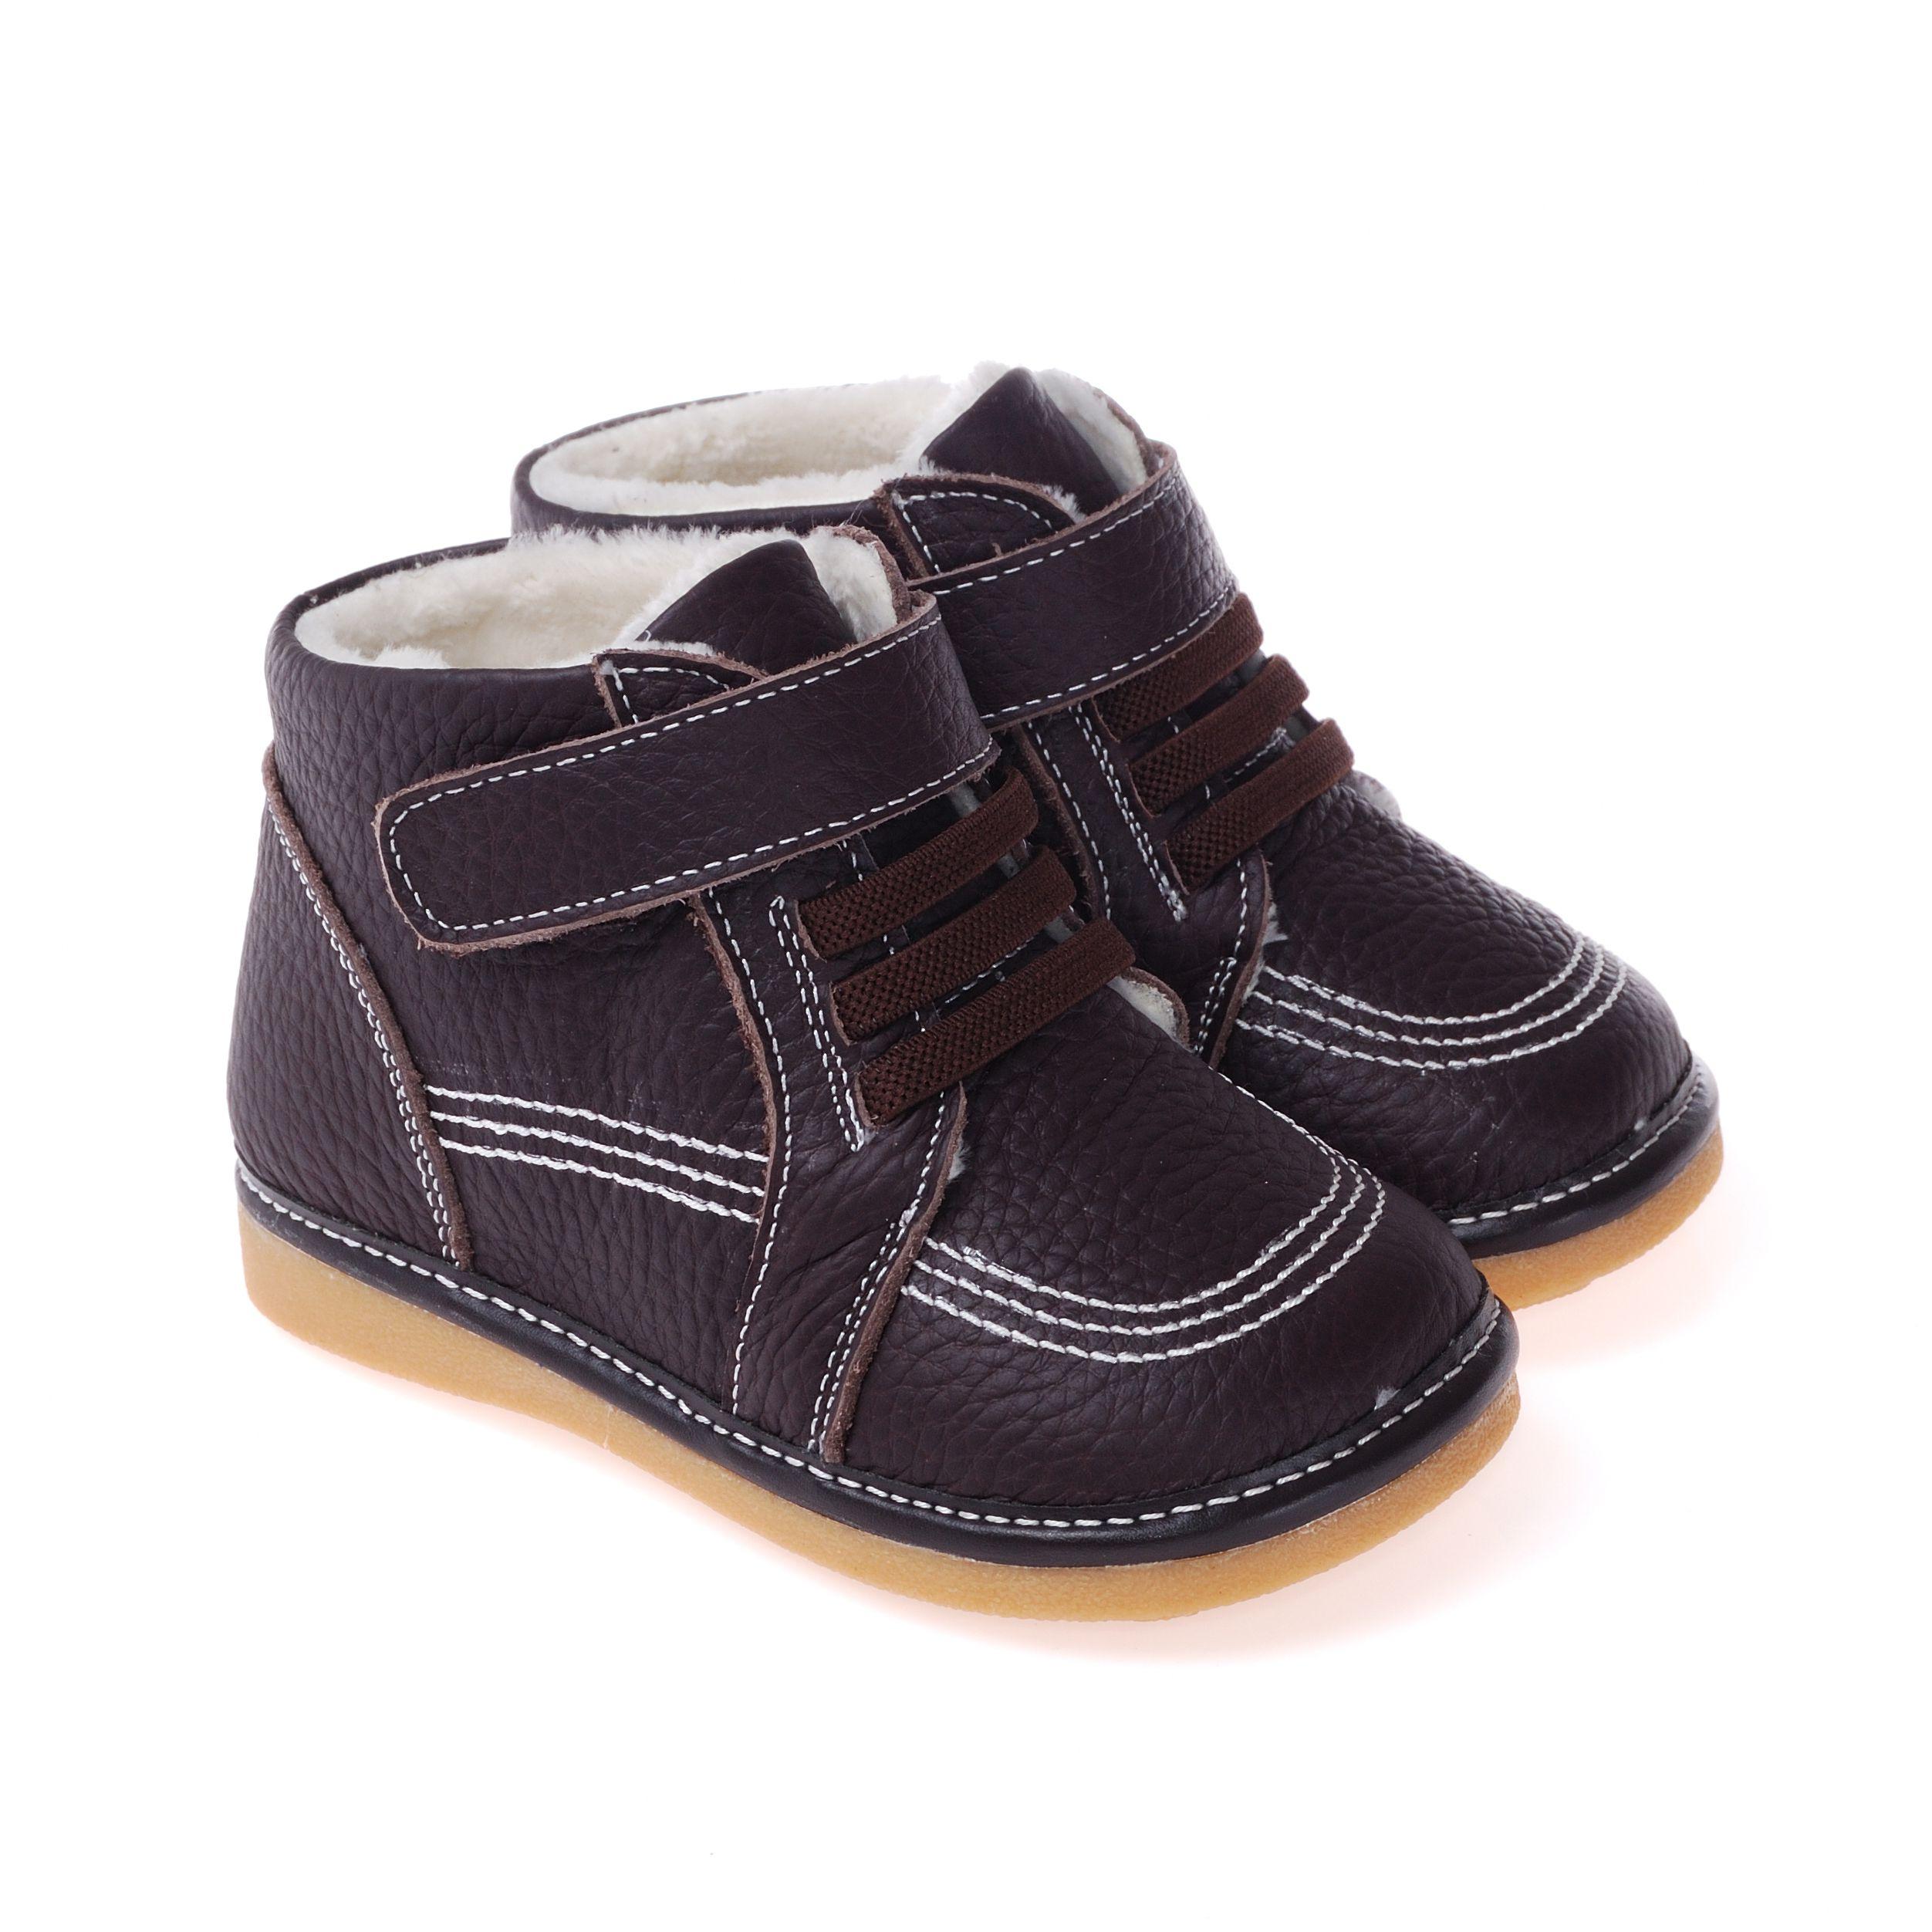 de222d35d Caroch | Jake Boots | Boys | Tiptoe & Co Boys genuine leather boots in  Chocolate